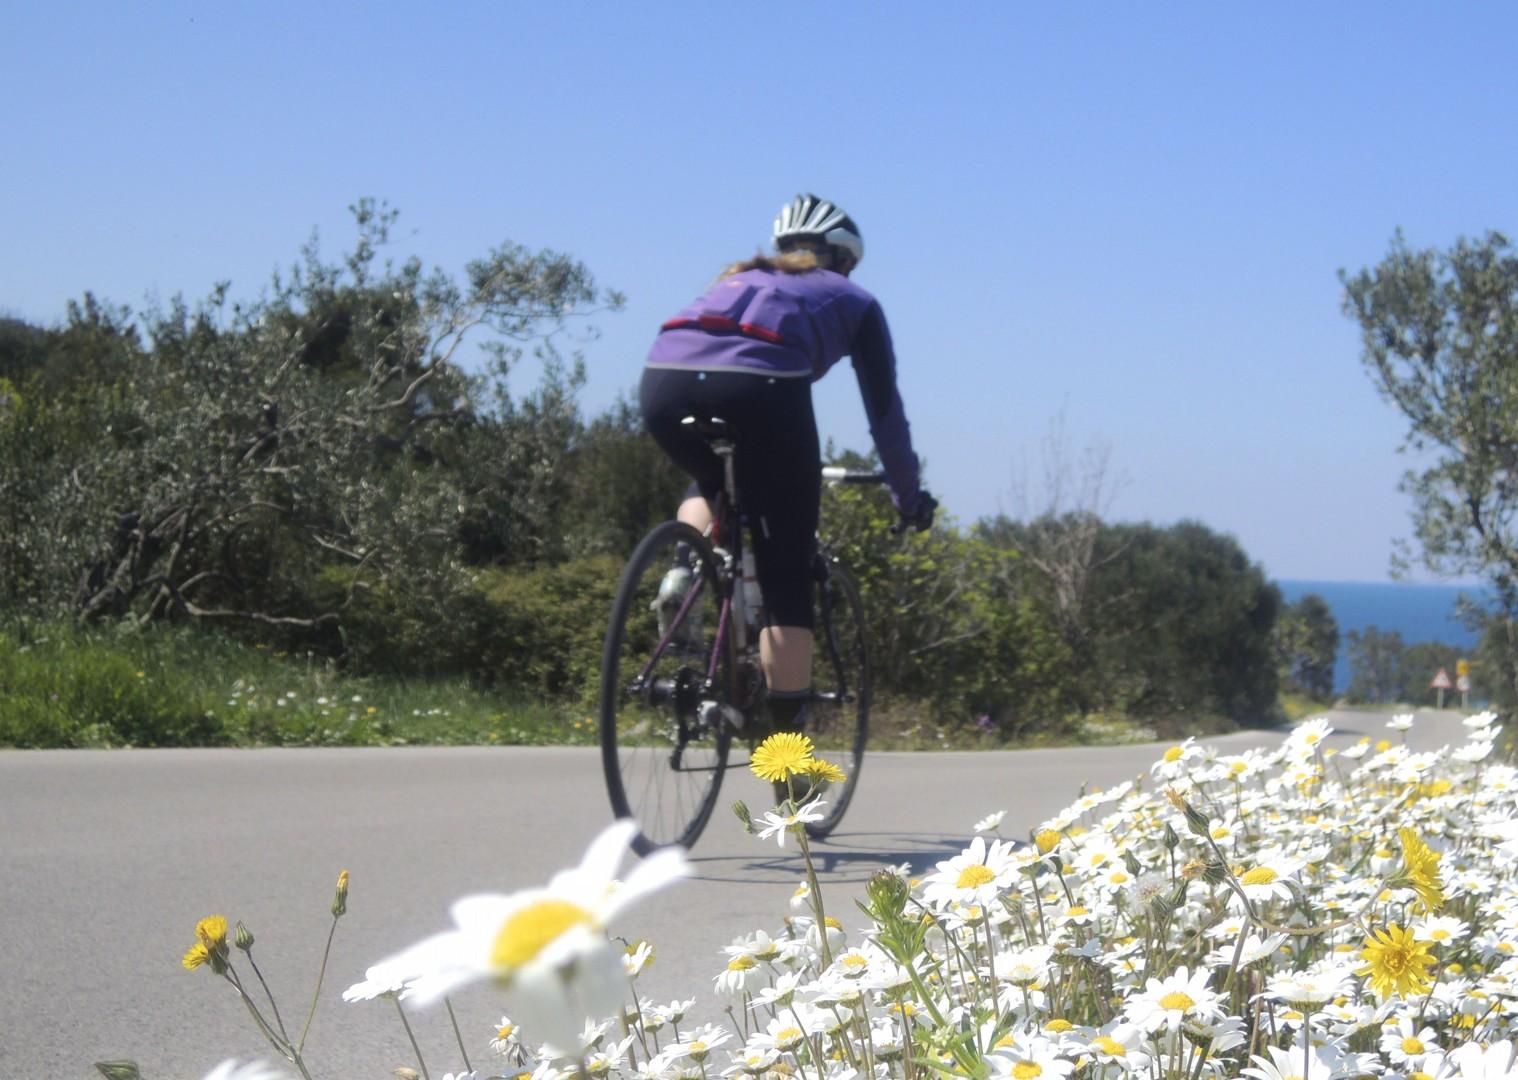 croatiaroad12.jpg - Slovenia and Croatia - Slovenian Alps to Dalmatian Coast - Guided Road Cycling Holiday - Road Cycling